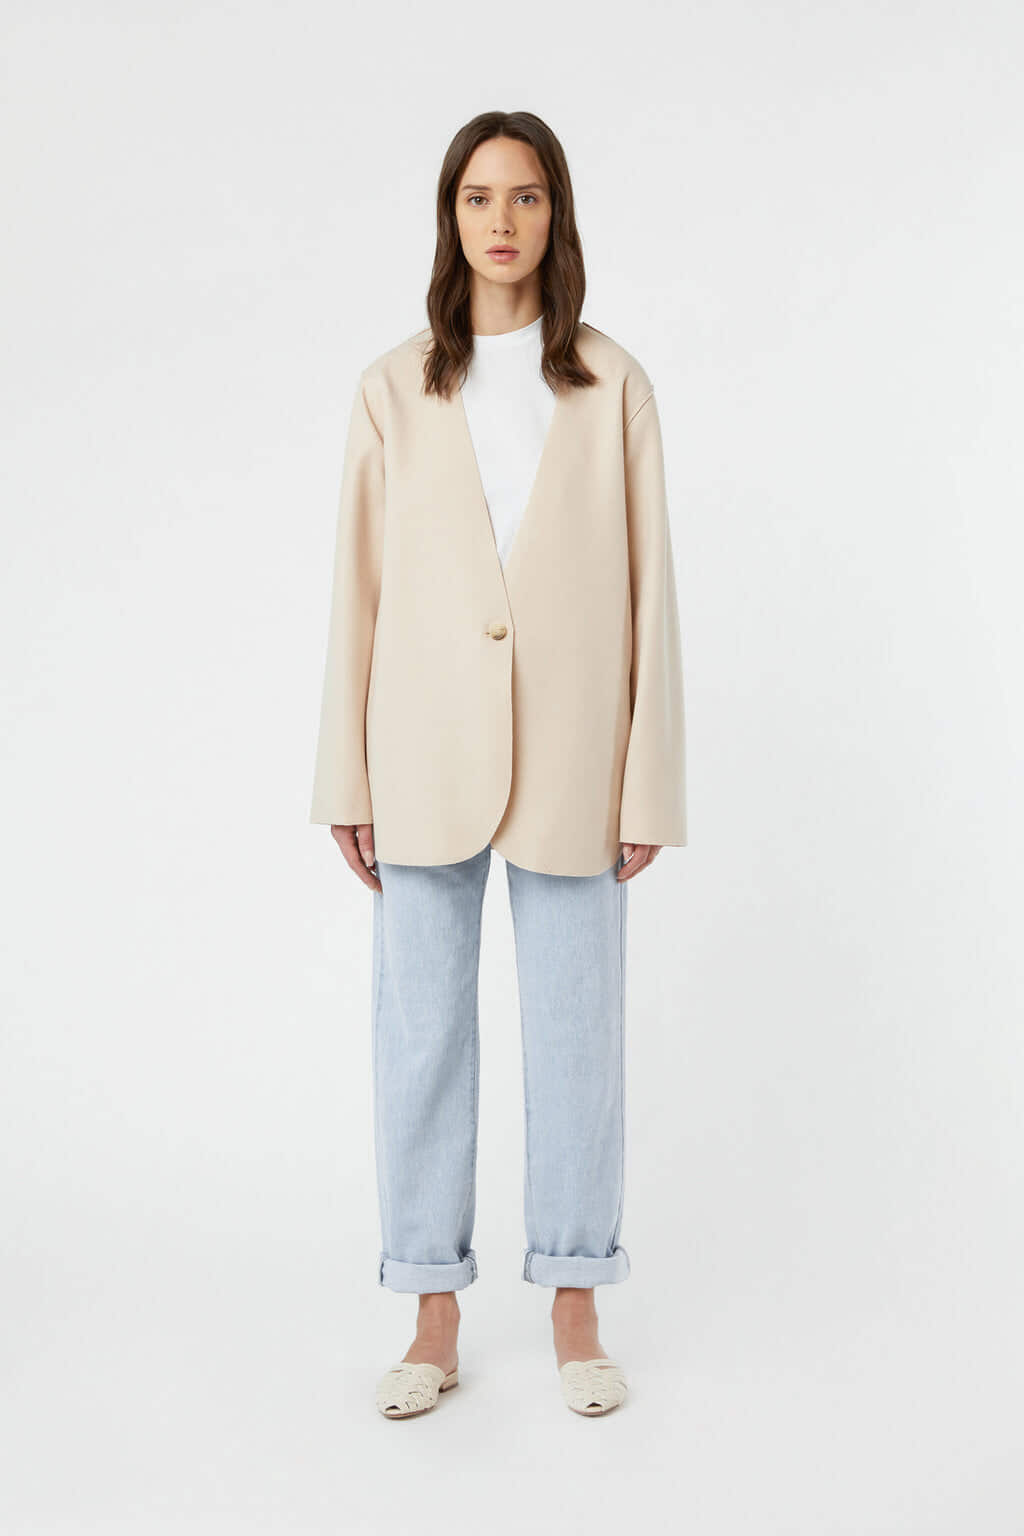 Jacket J009 Cream 3